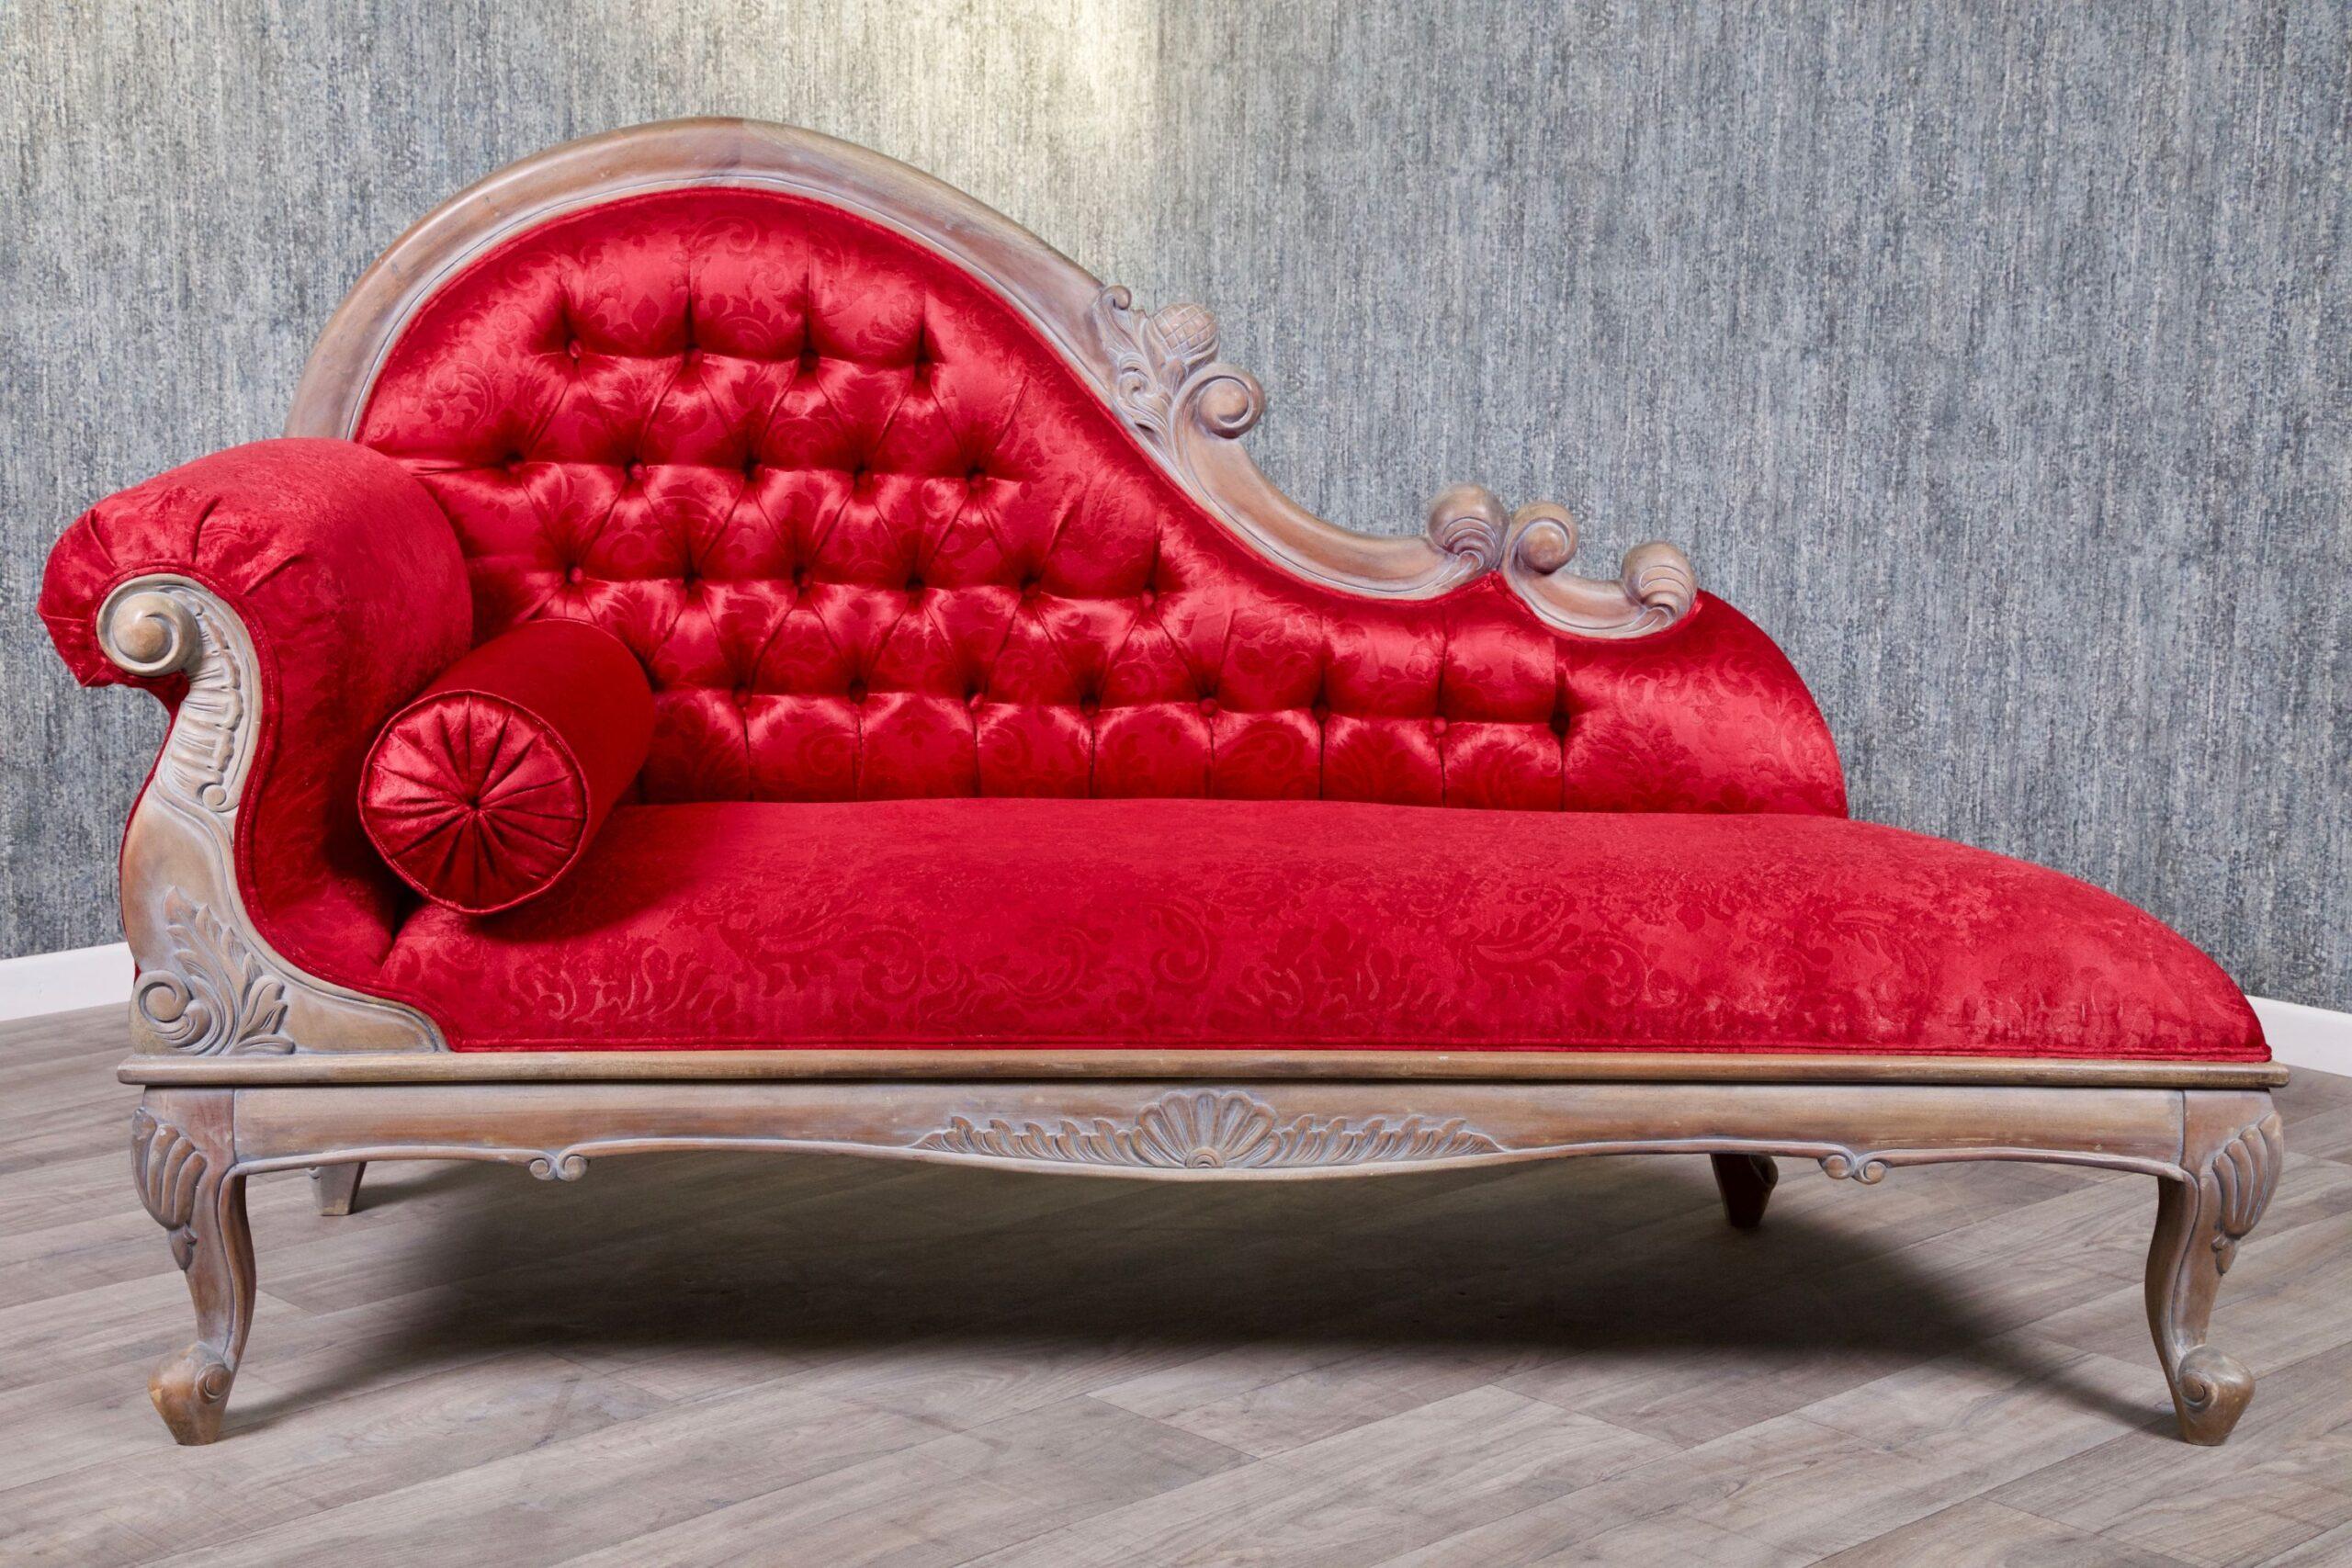 Full Size of Recamiere Barock Modena 2229 Sofas Bett Sofa Mit Wohnzimmer Recamiere Barock